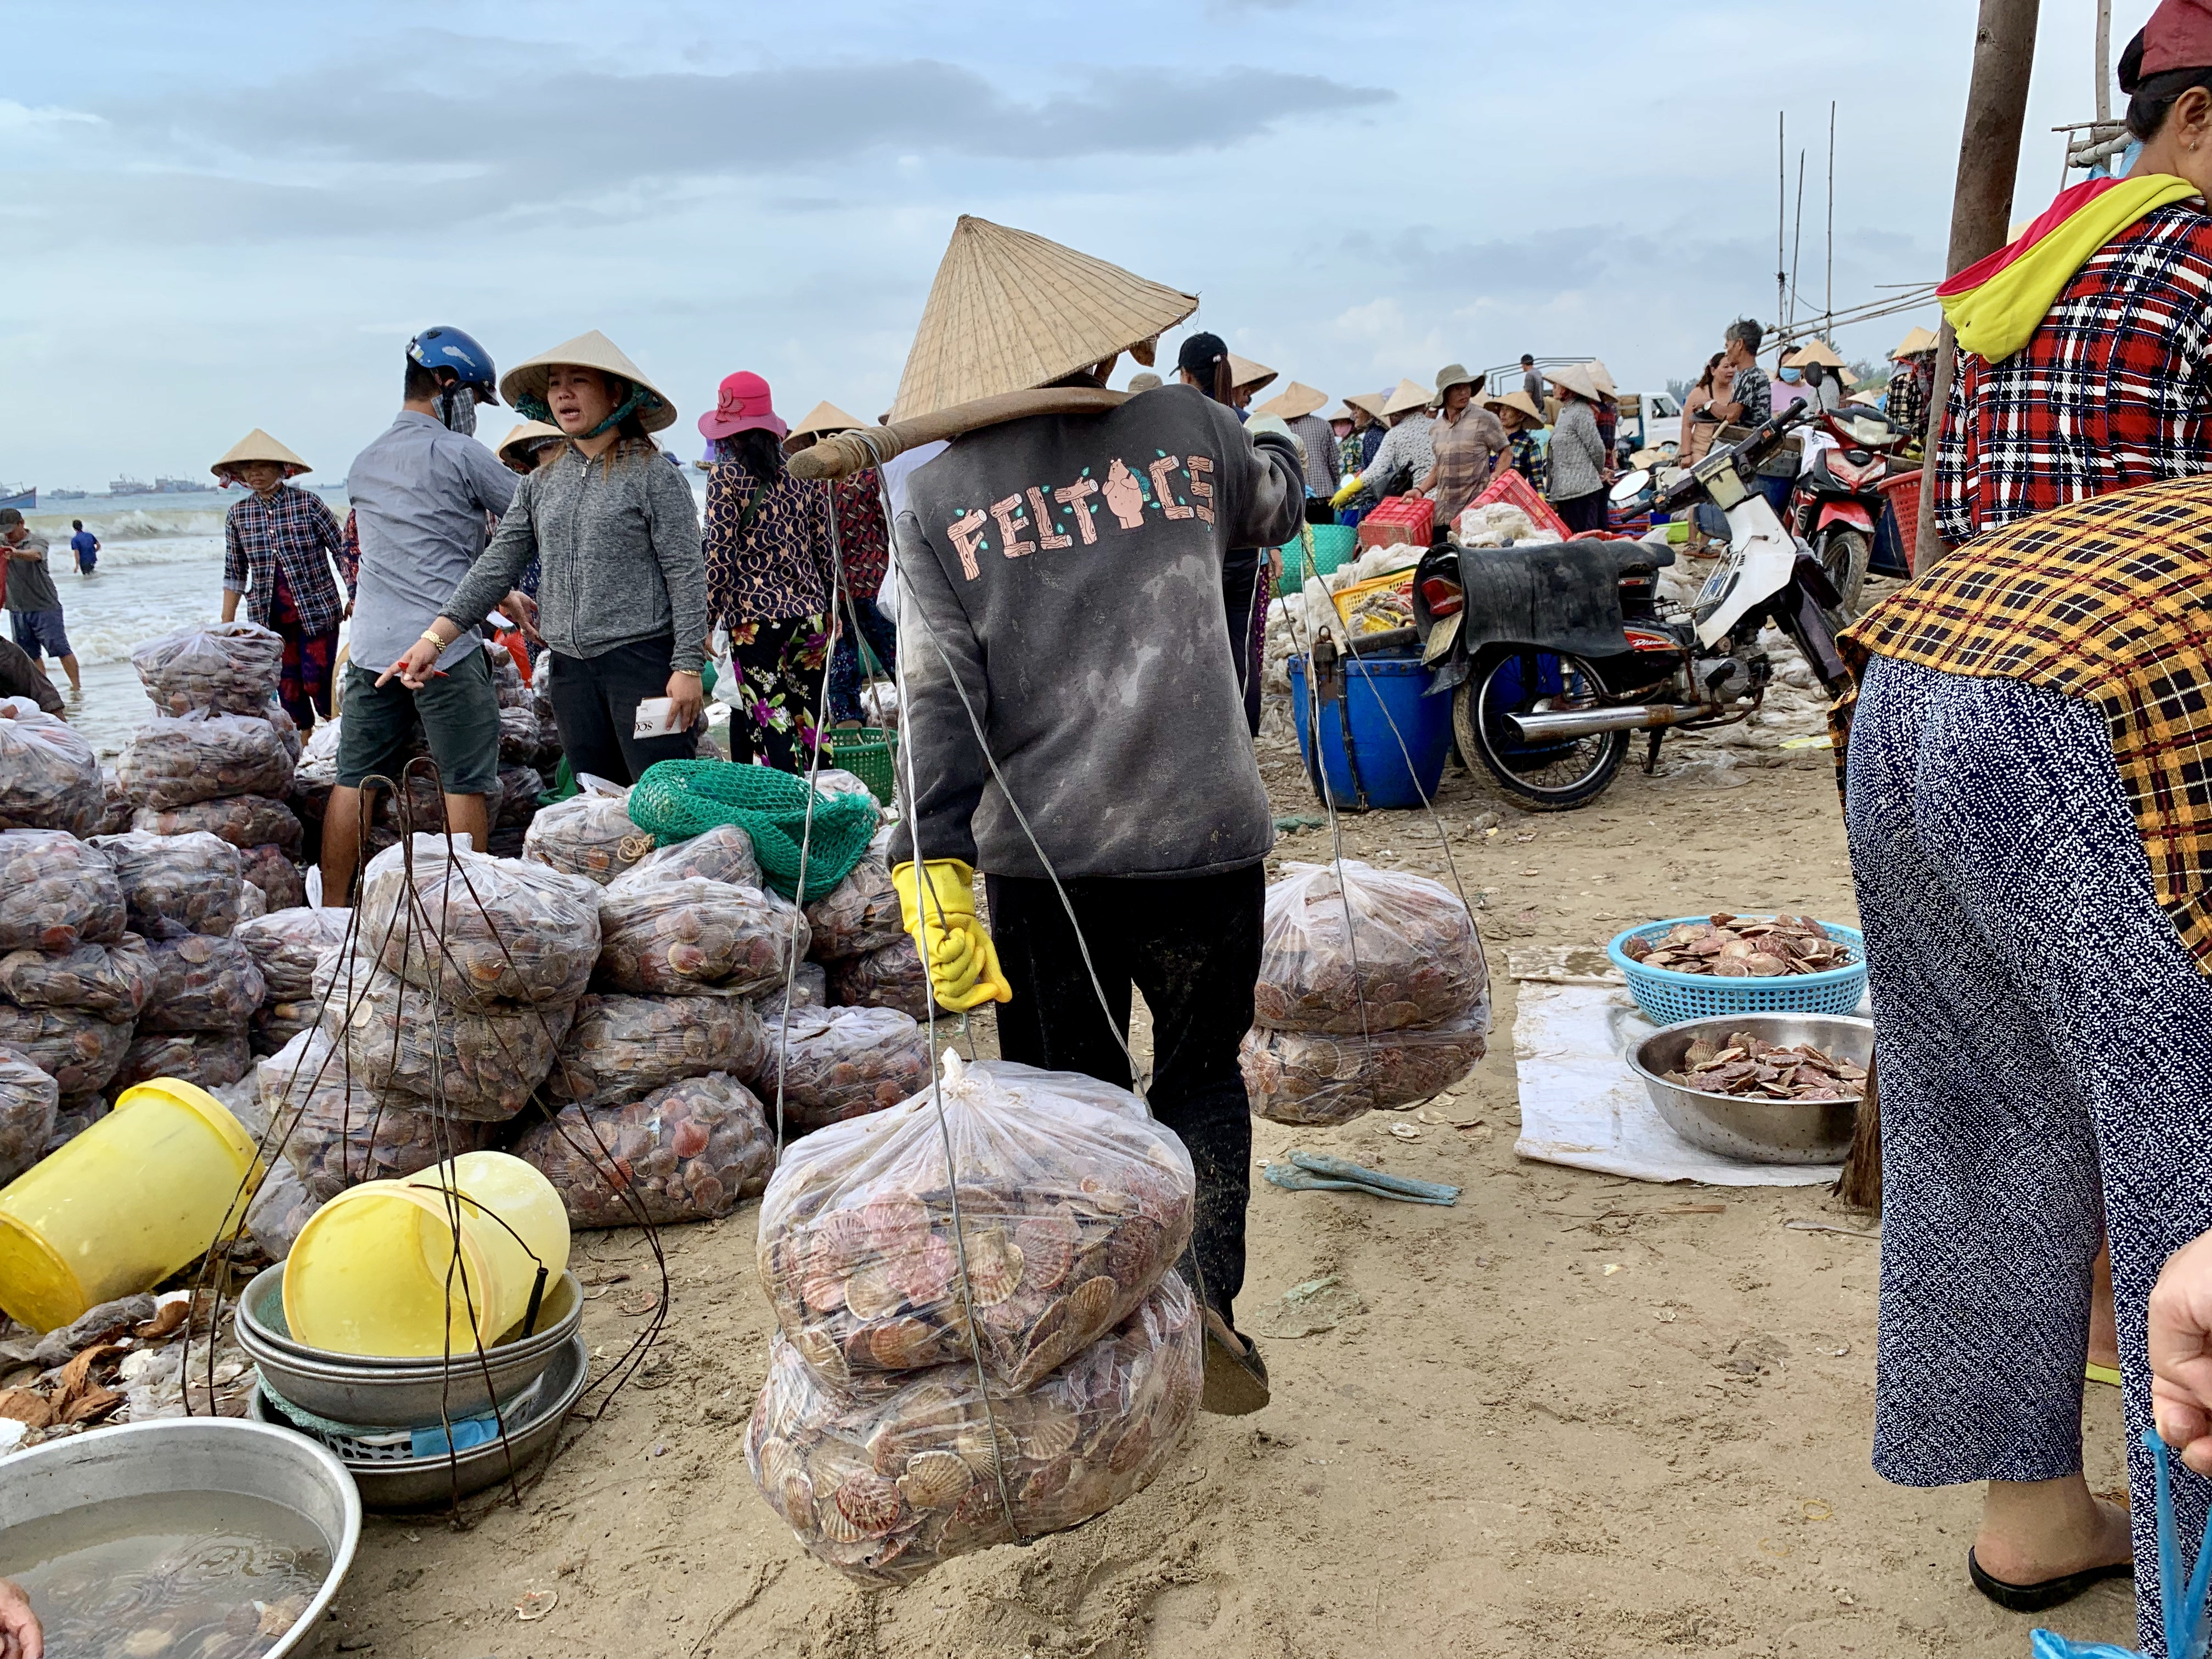 Merchants trade seafood at a local fishing village in Mui Ne, Vietnam July 31, 2019. Photo: Tran Phuong / Tuoi Tre